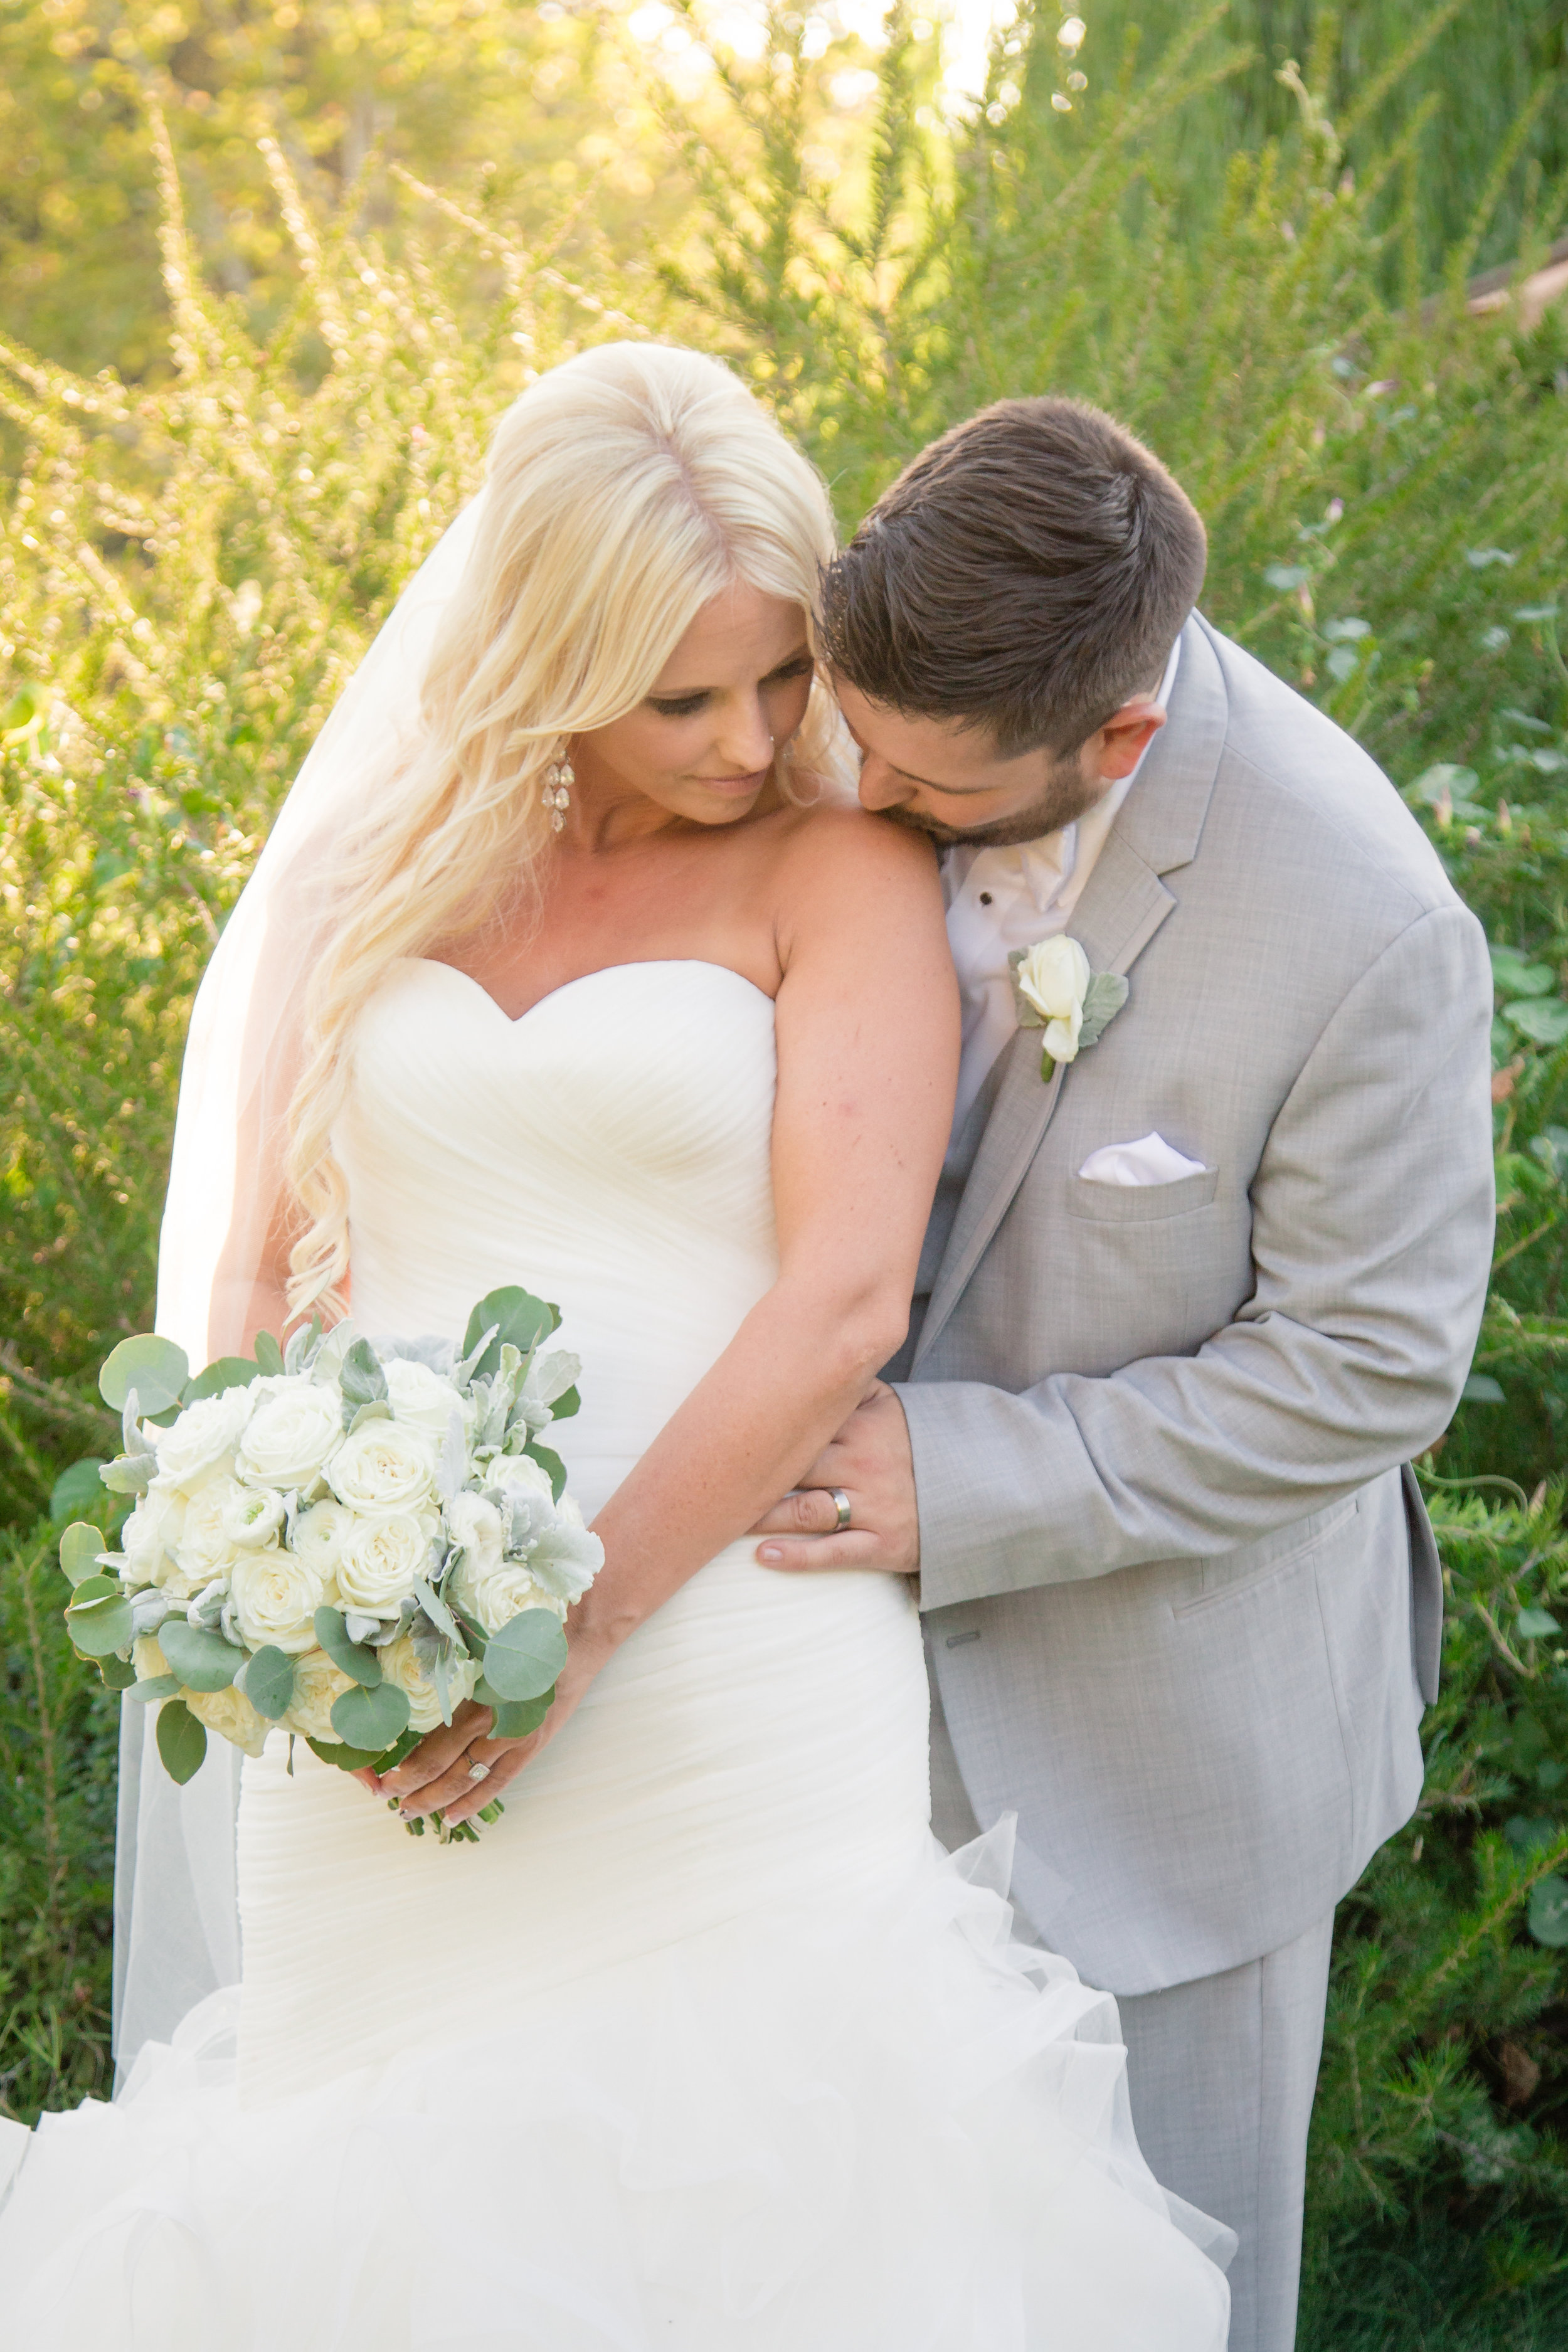 White Ranch Events - Chico - Ashley Teasley Photography - Sacramento Wedding Photographer20.JPG